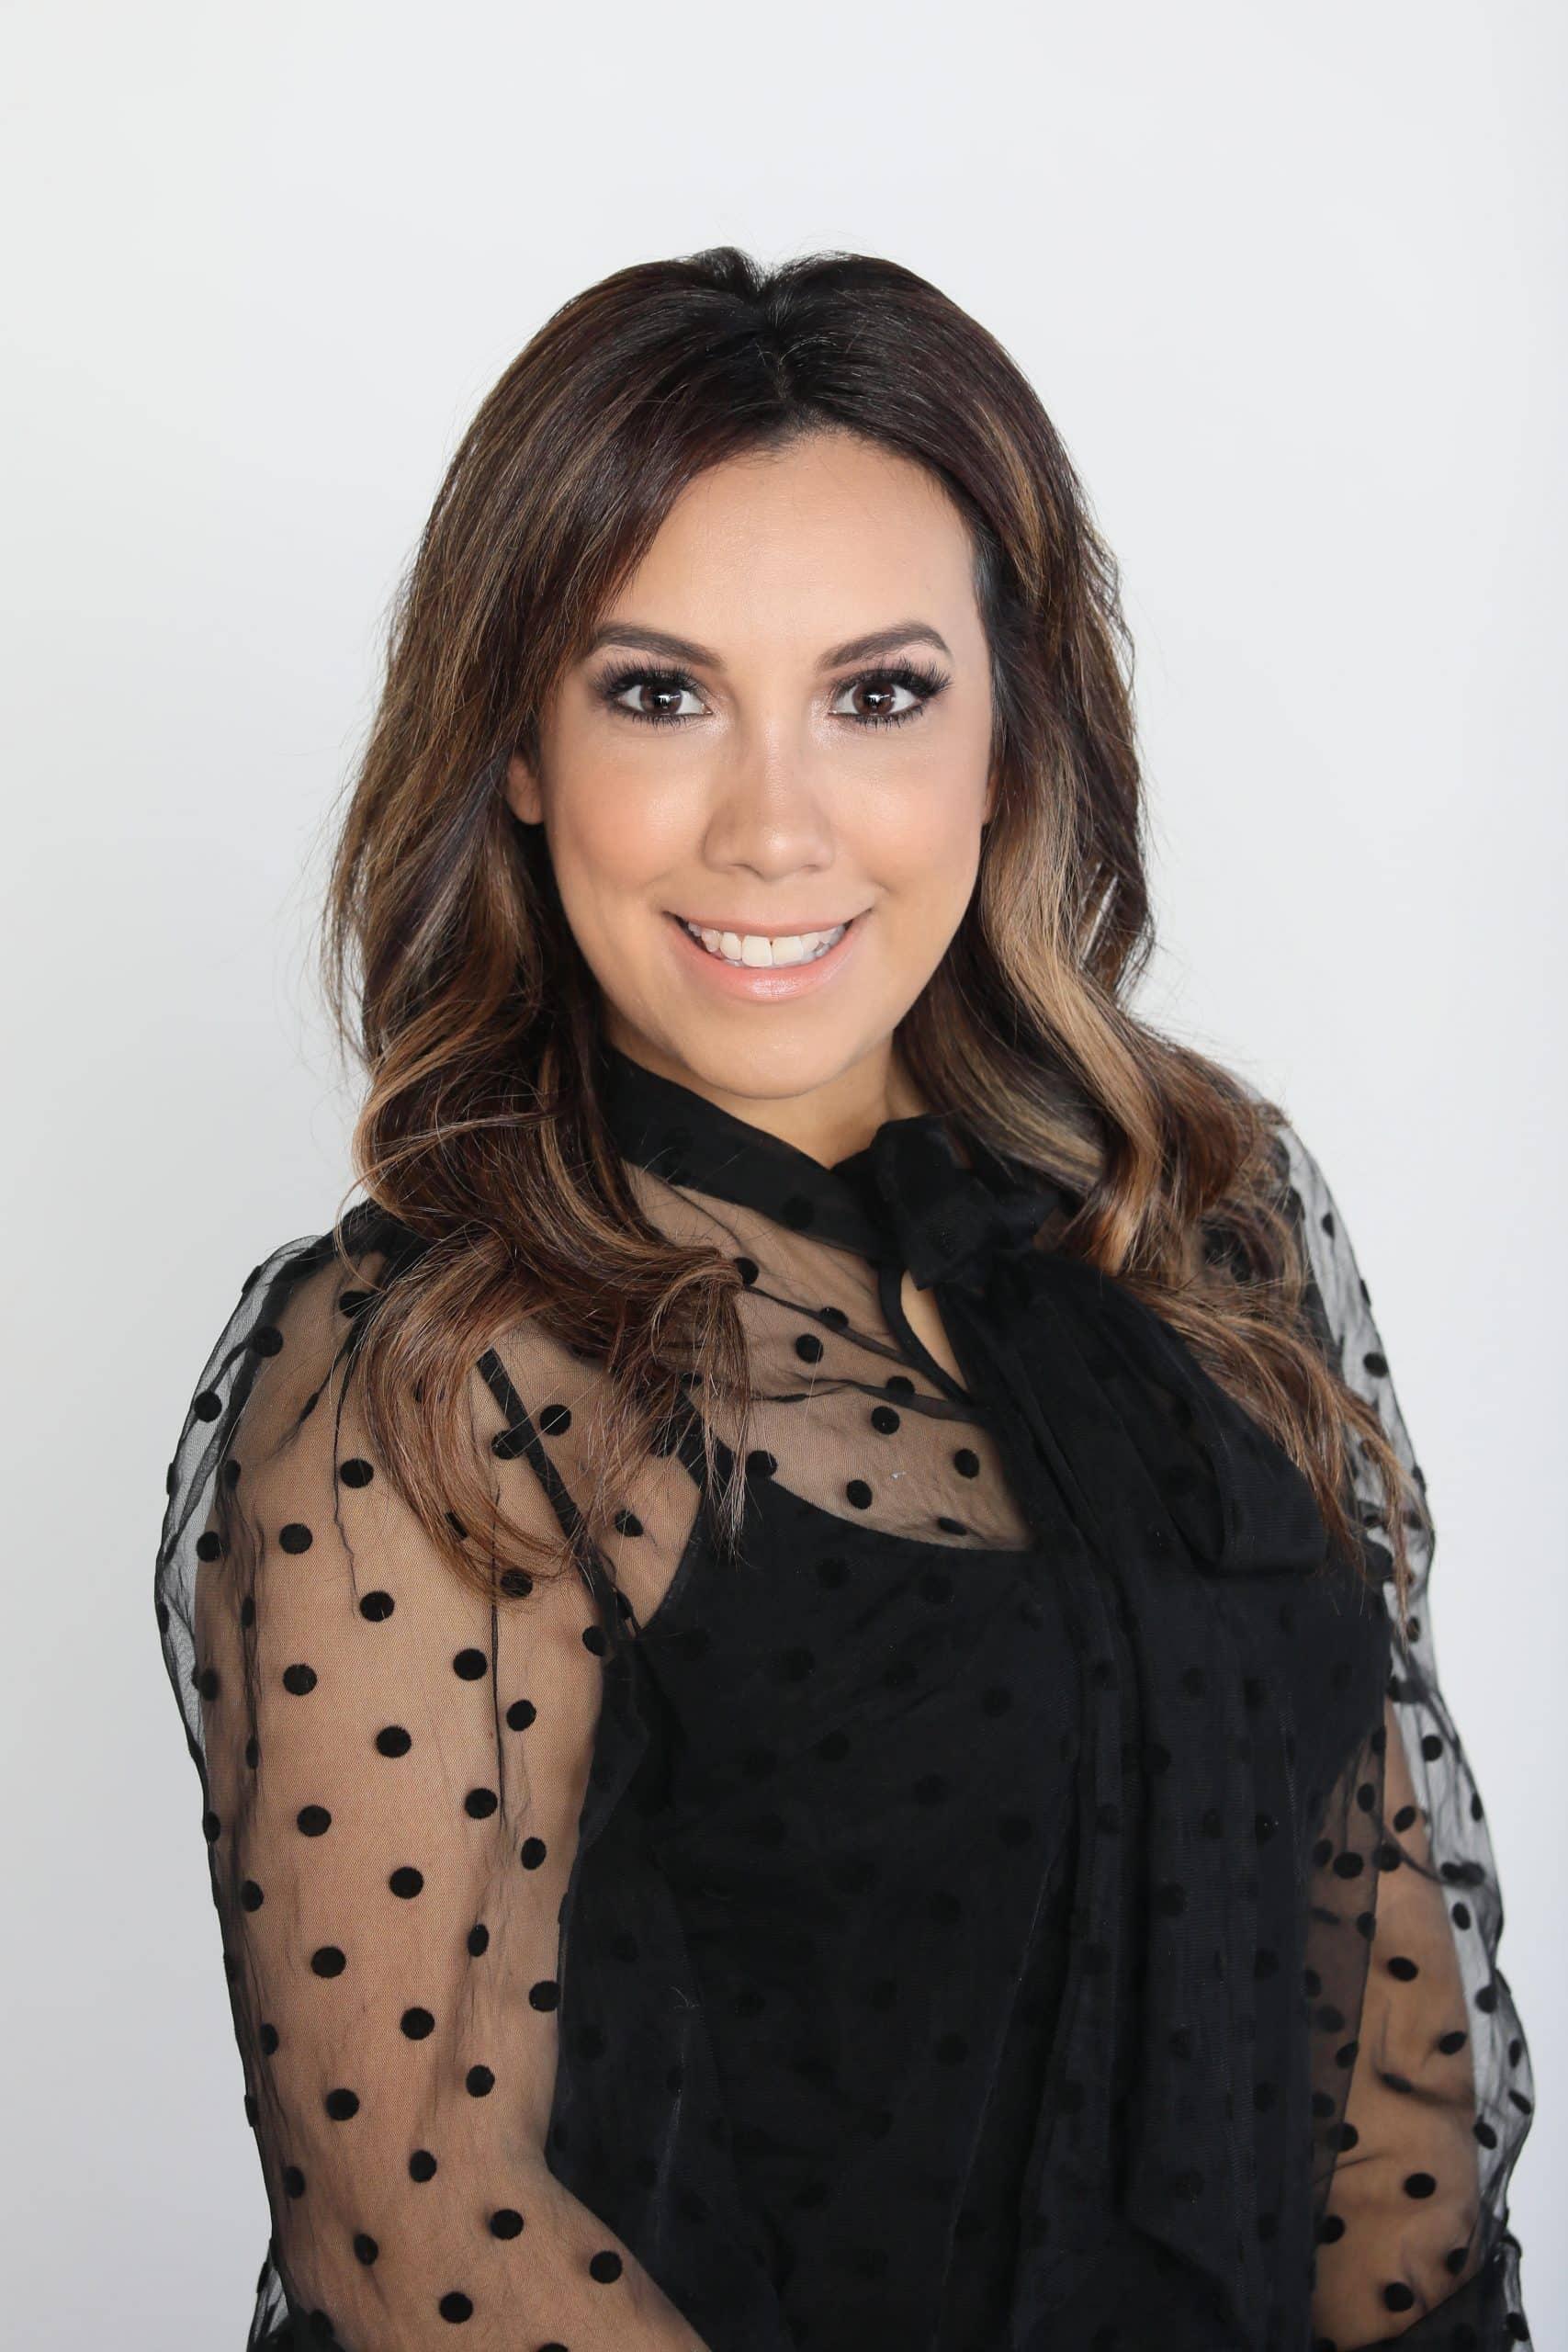 Laura Jamieson